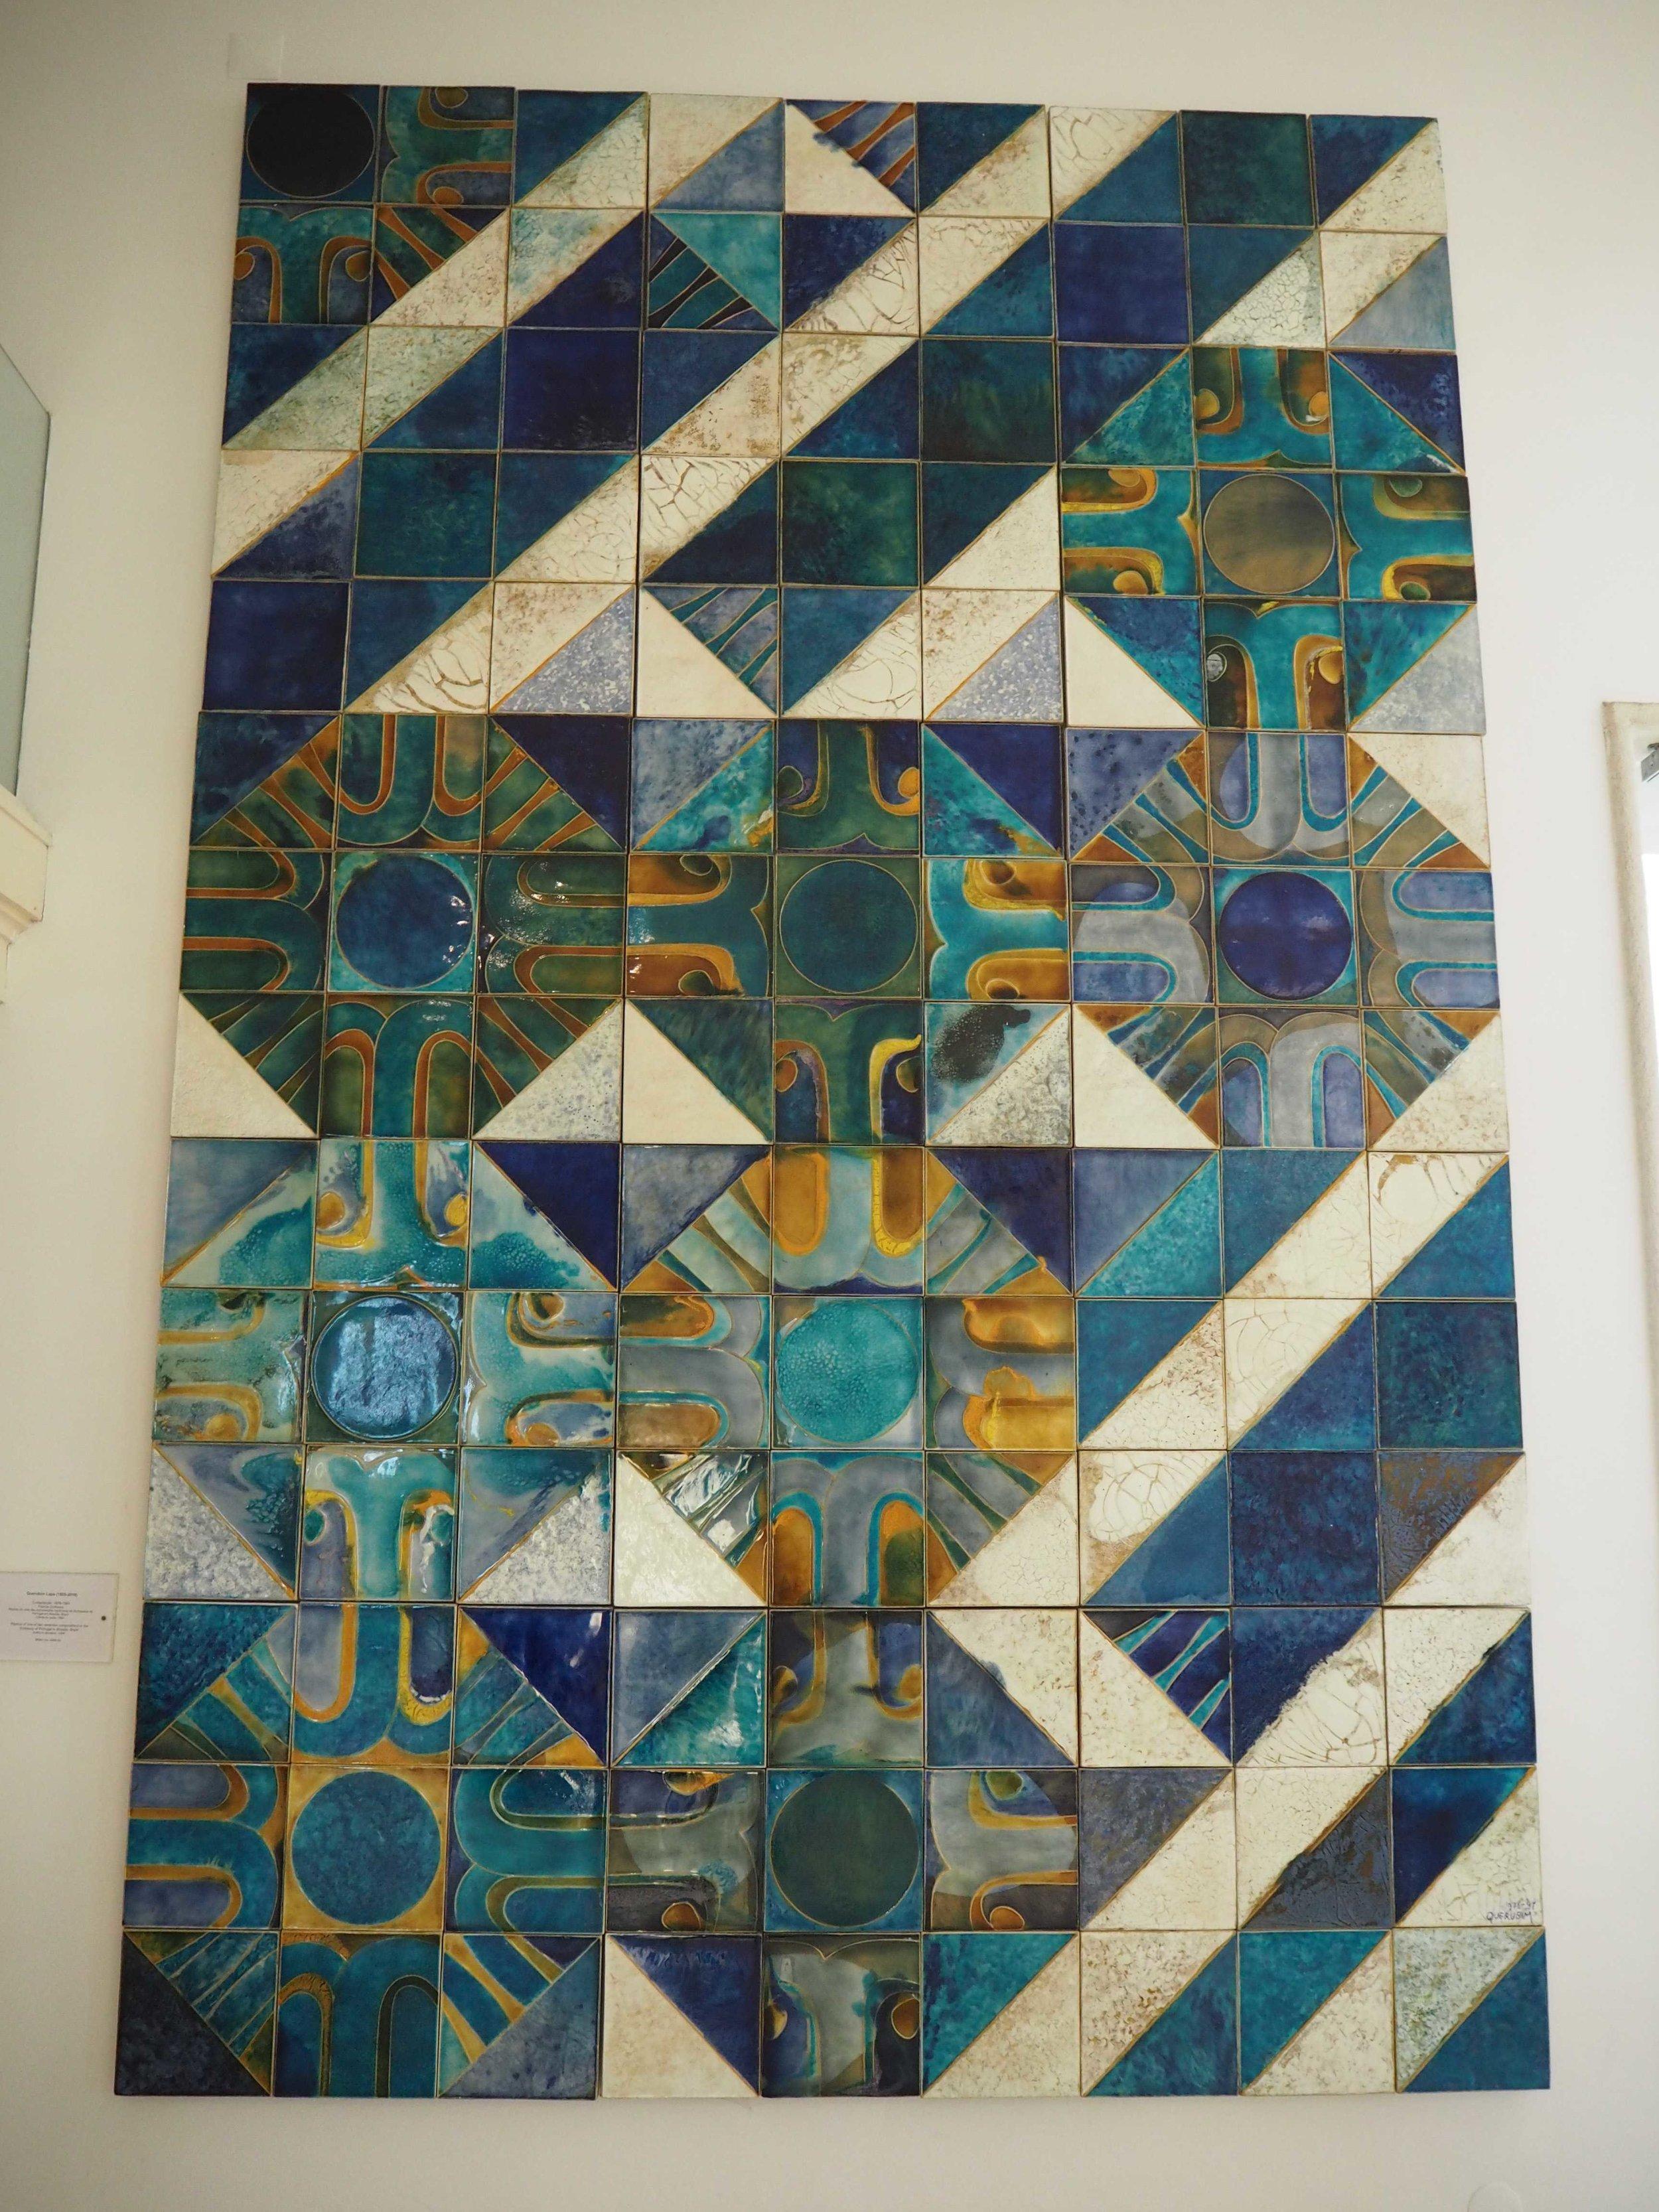 Tiles in the National Tile Museum Lisbon